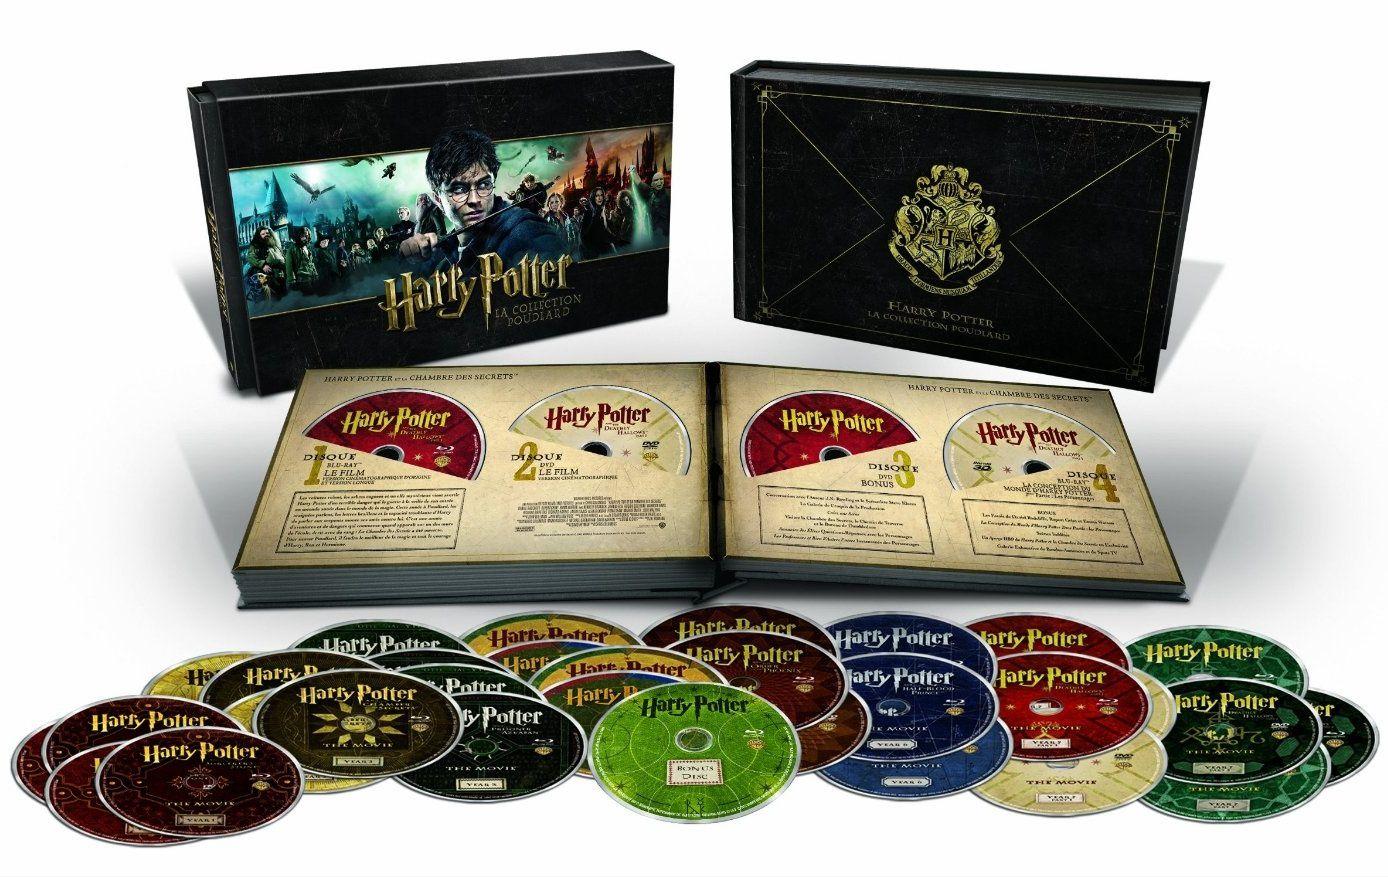 Harry Potter, la collection Poudlard 2014 en 31 dvd/blu-ray en France